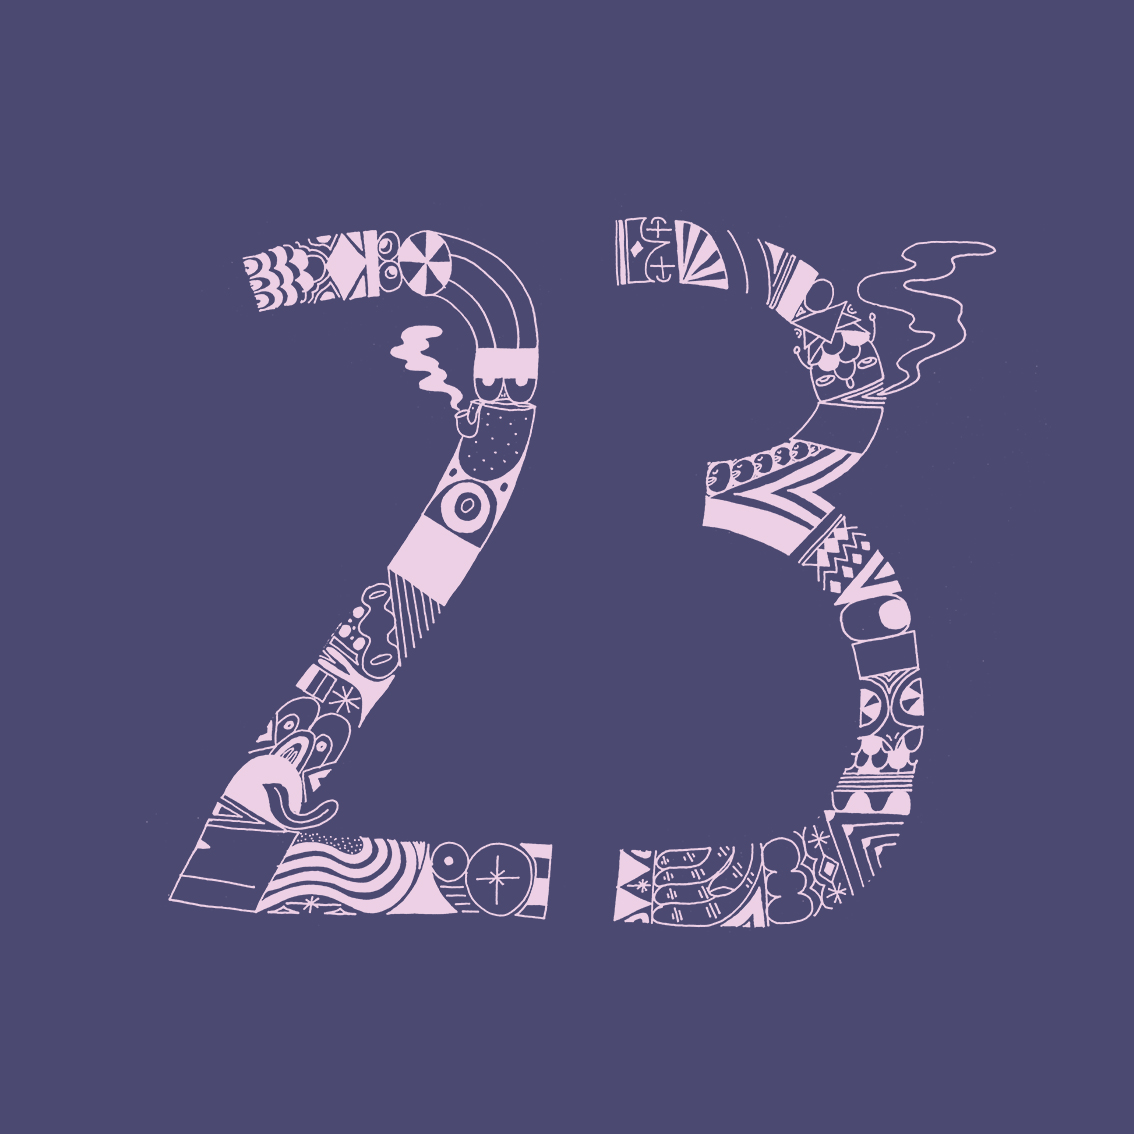 23_SEP19 v1.1.jpg